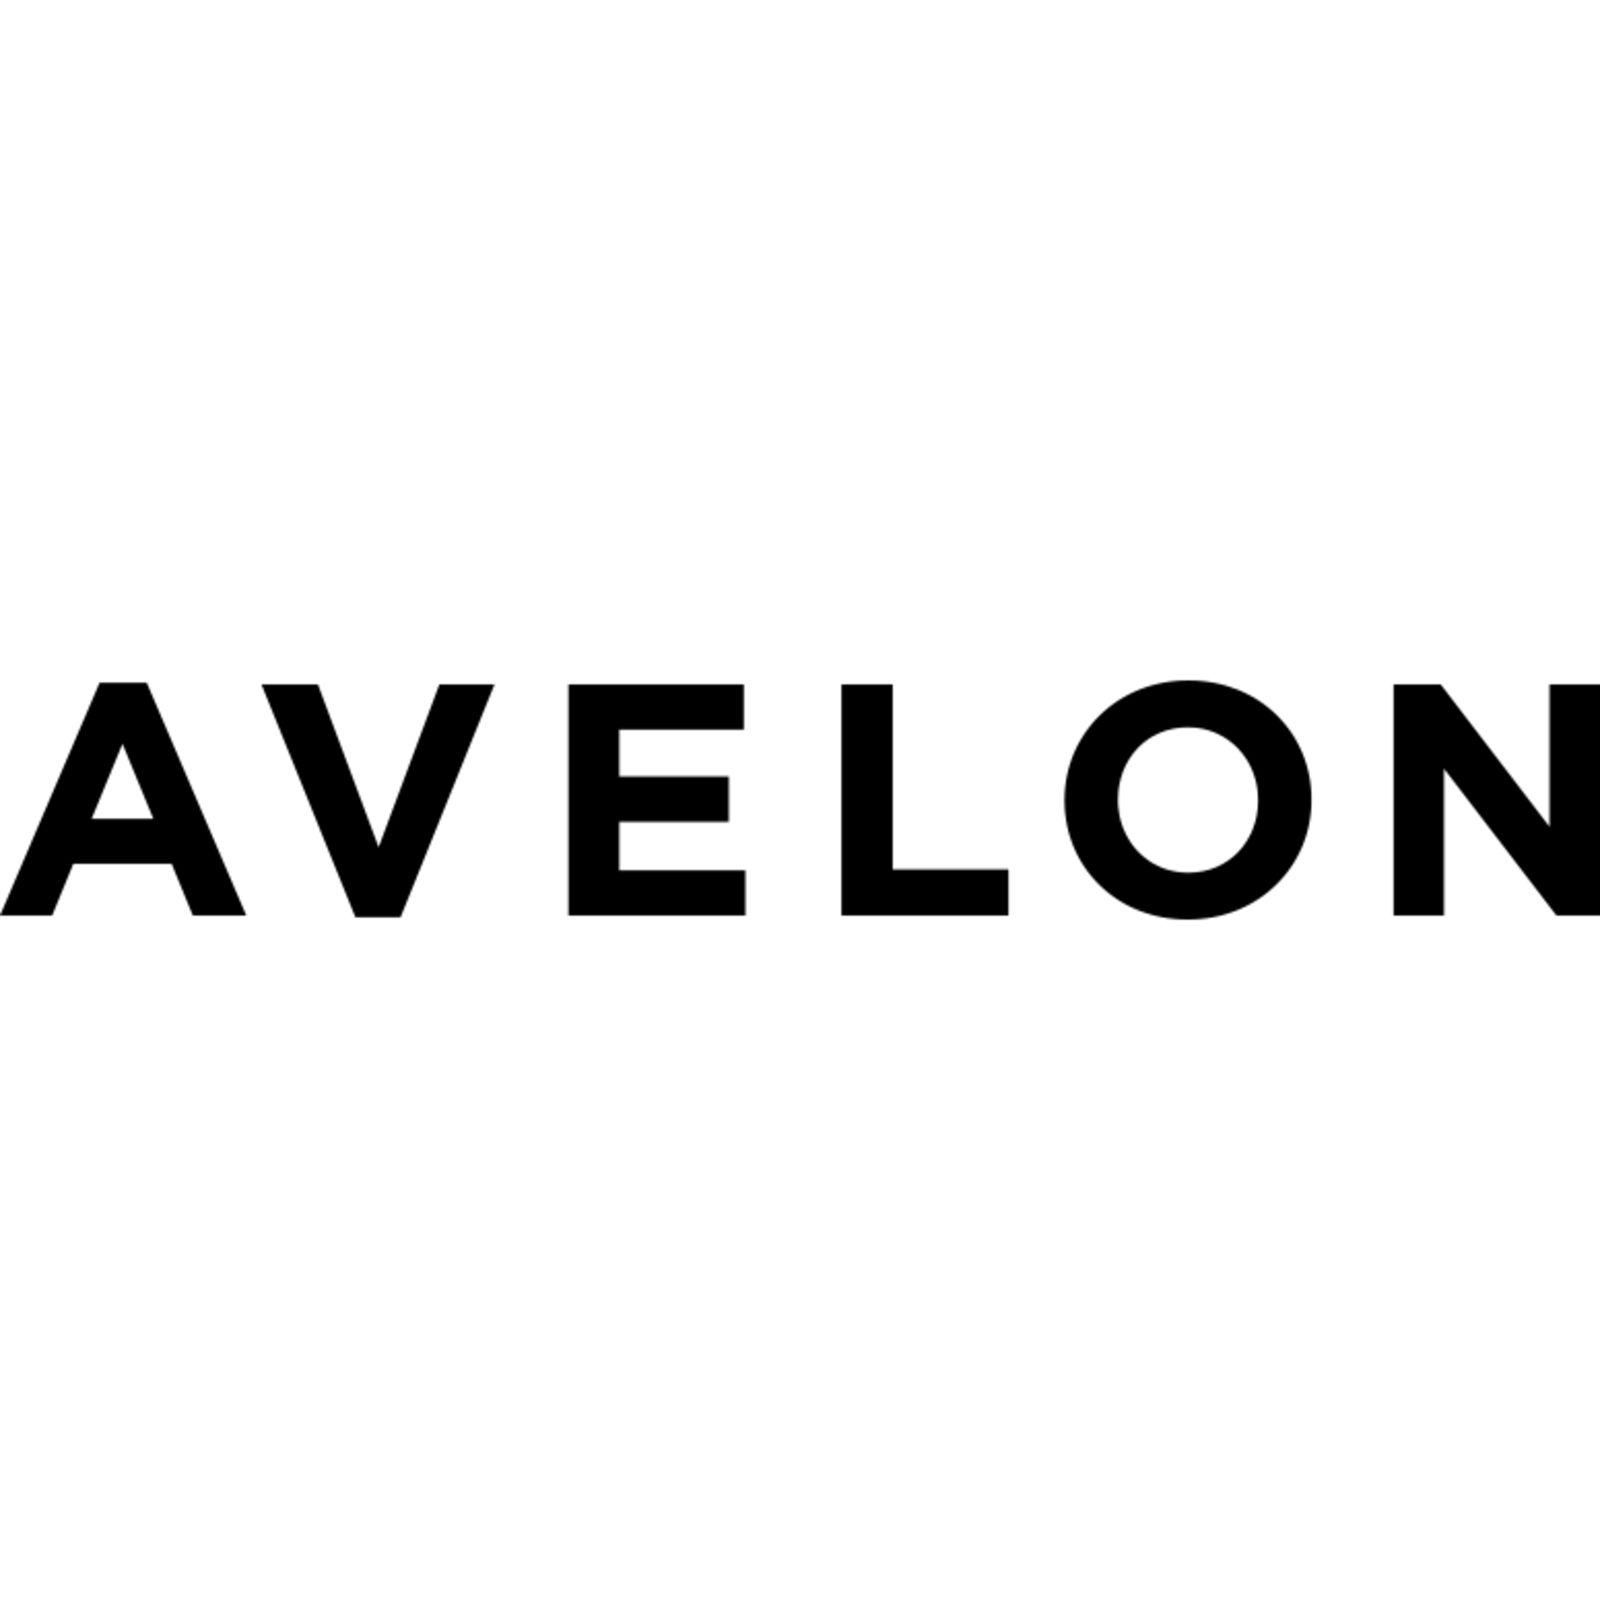 AVELON (Image 1)